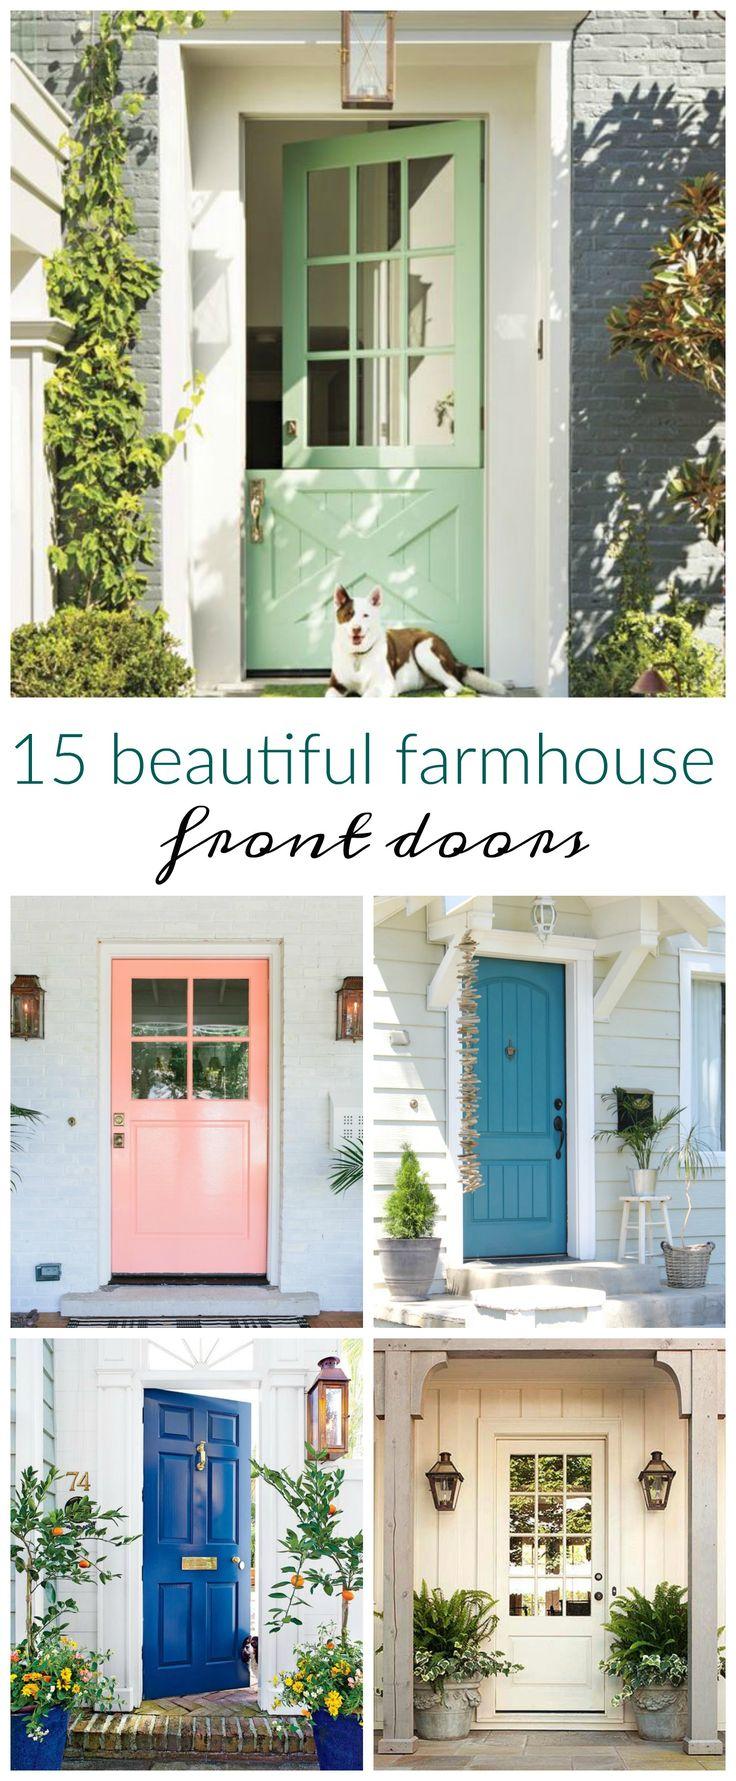 15 Beautiful Farmhouse Front Doors                                                                                                                                                                                 More